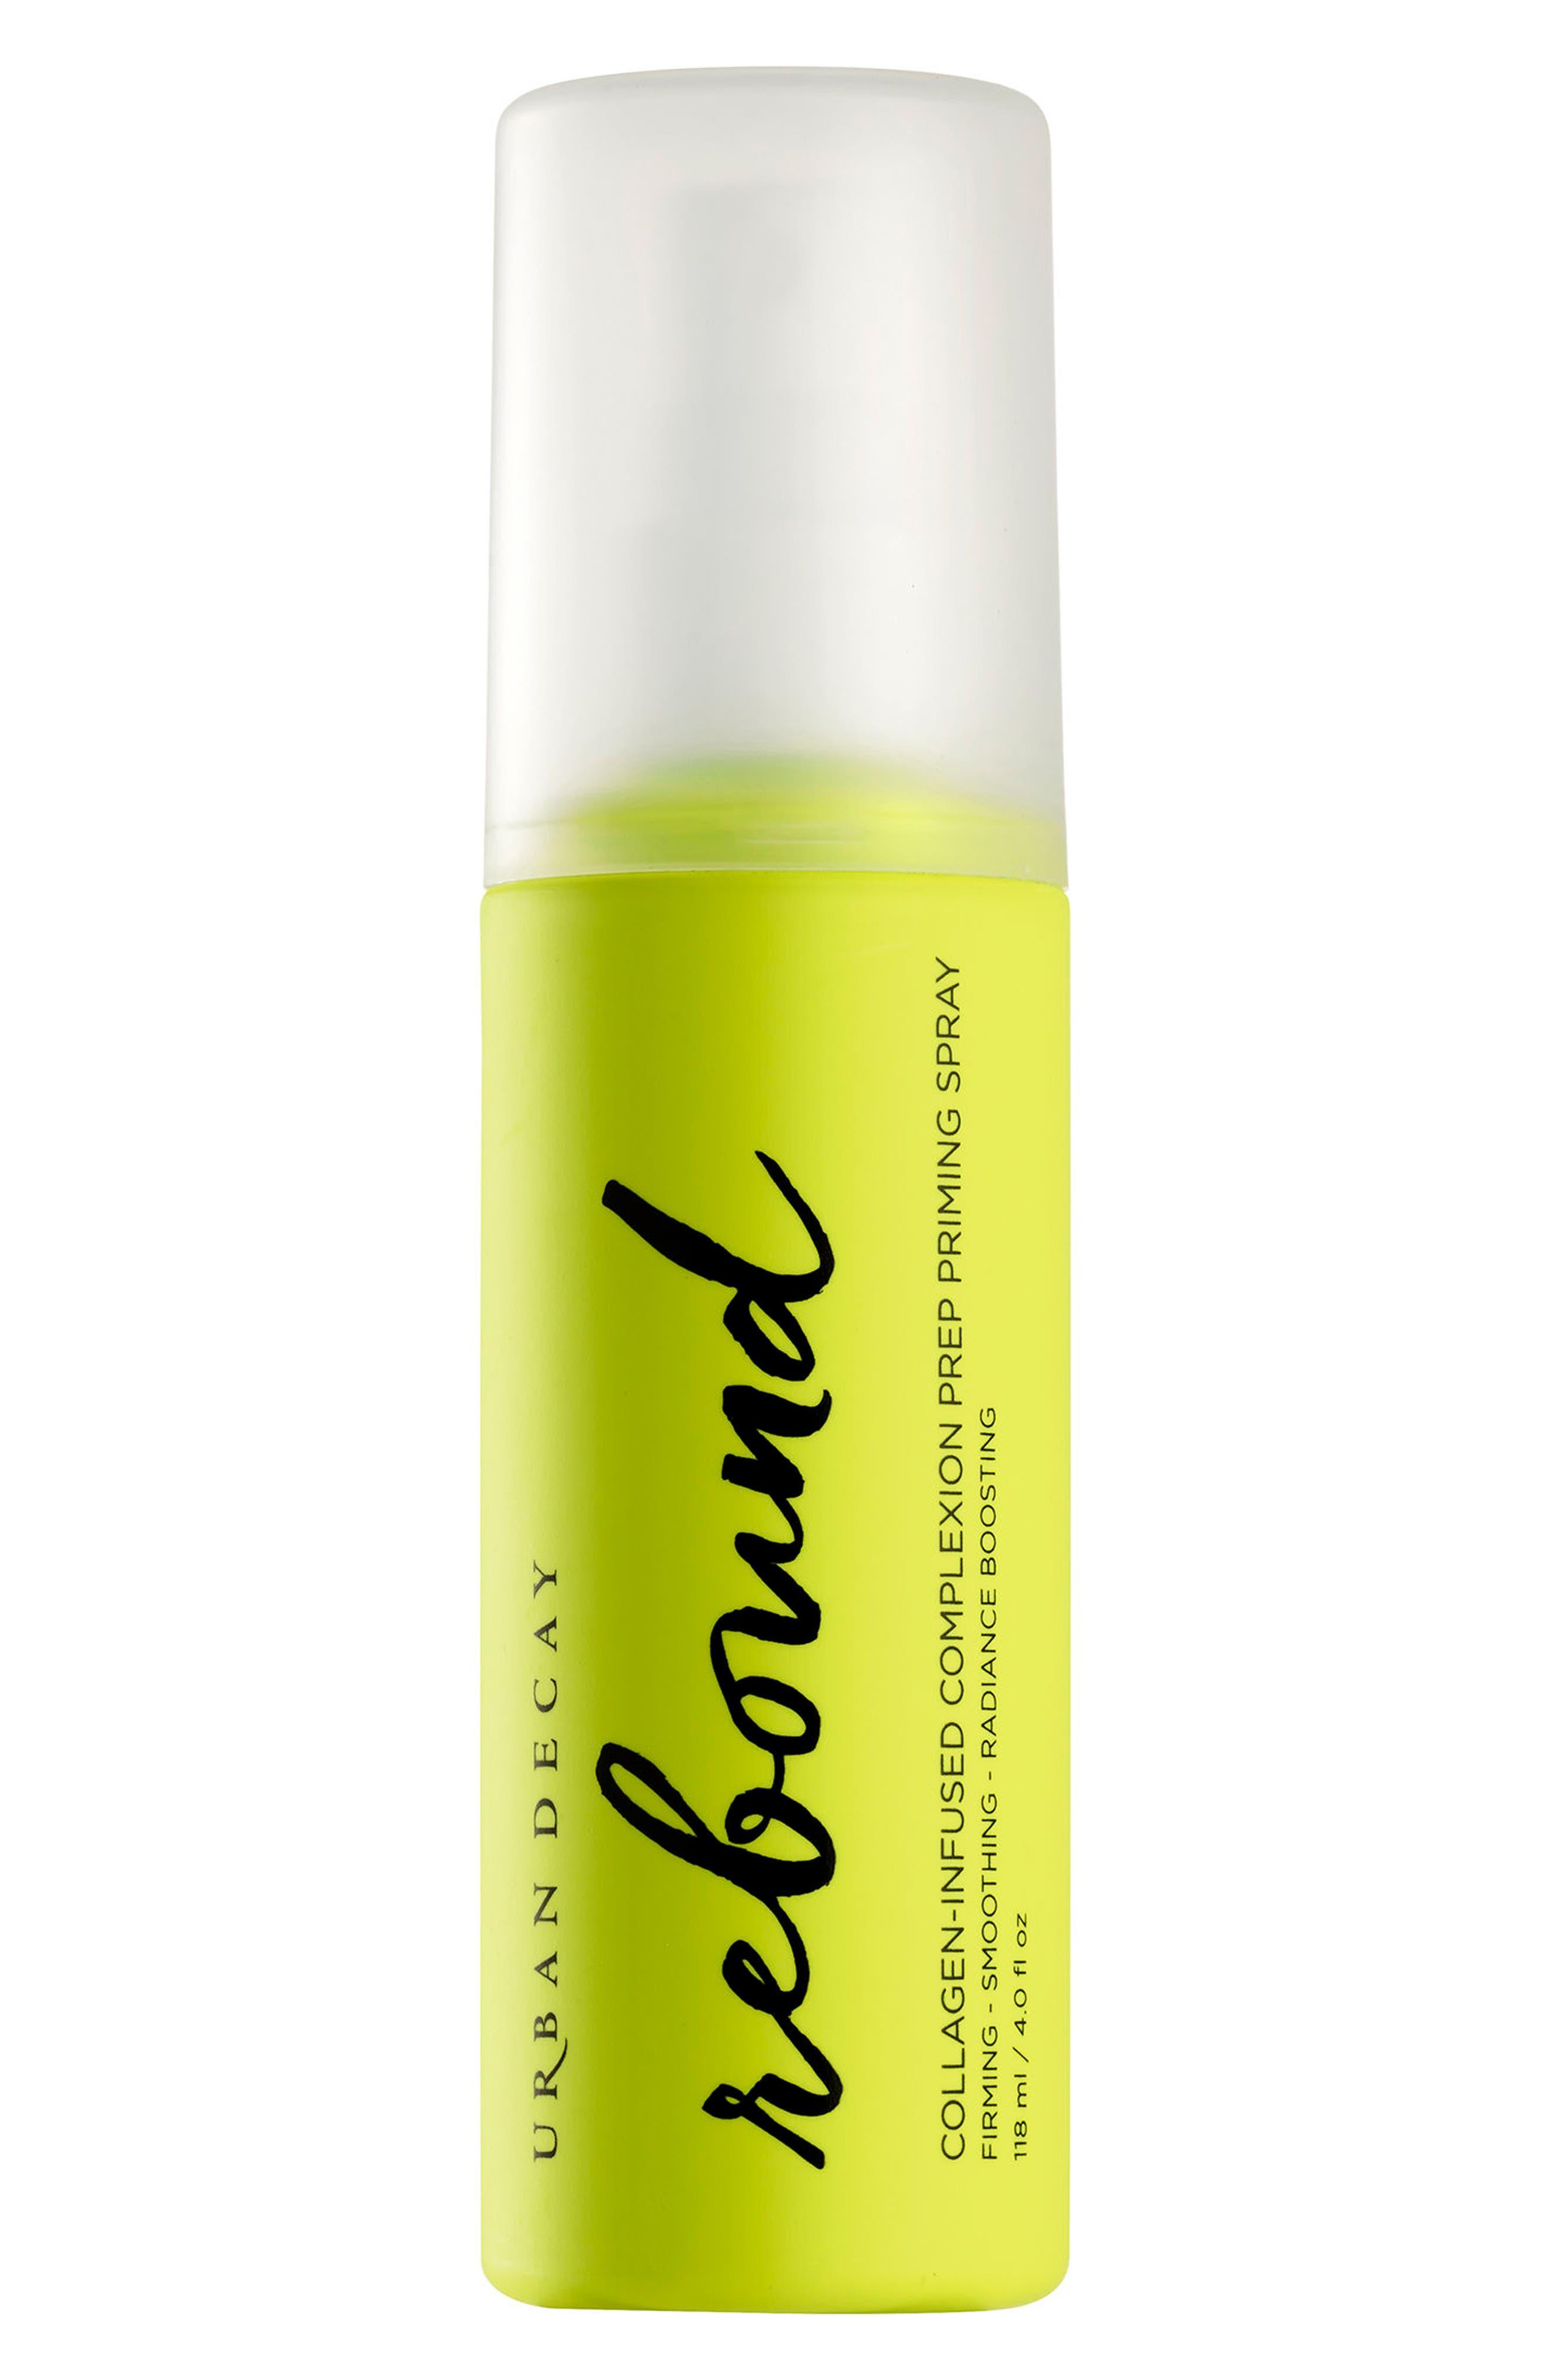 Rebound Collagen-Infused Complexion Prep Priming Spray,                             Main thumbnail 1, color,                             NO COLOR